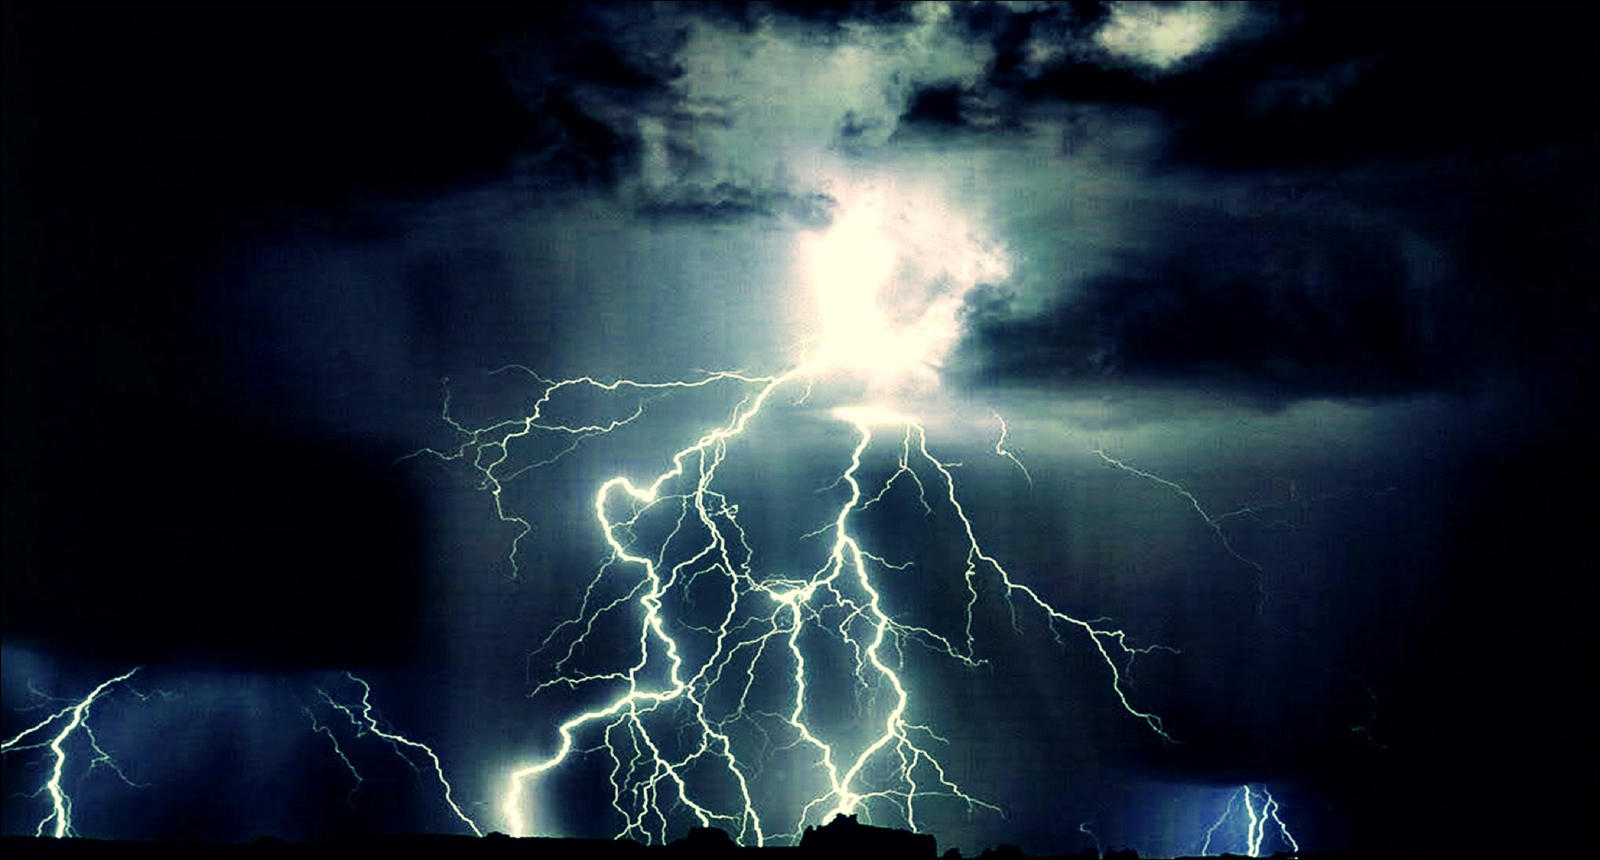 Thunderstorm In The Archipelago June 24  by eskile